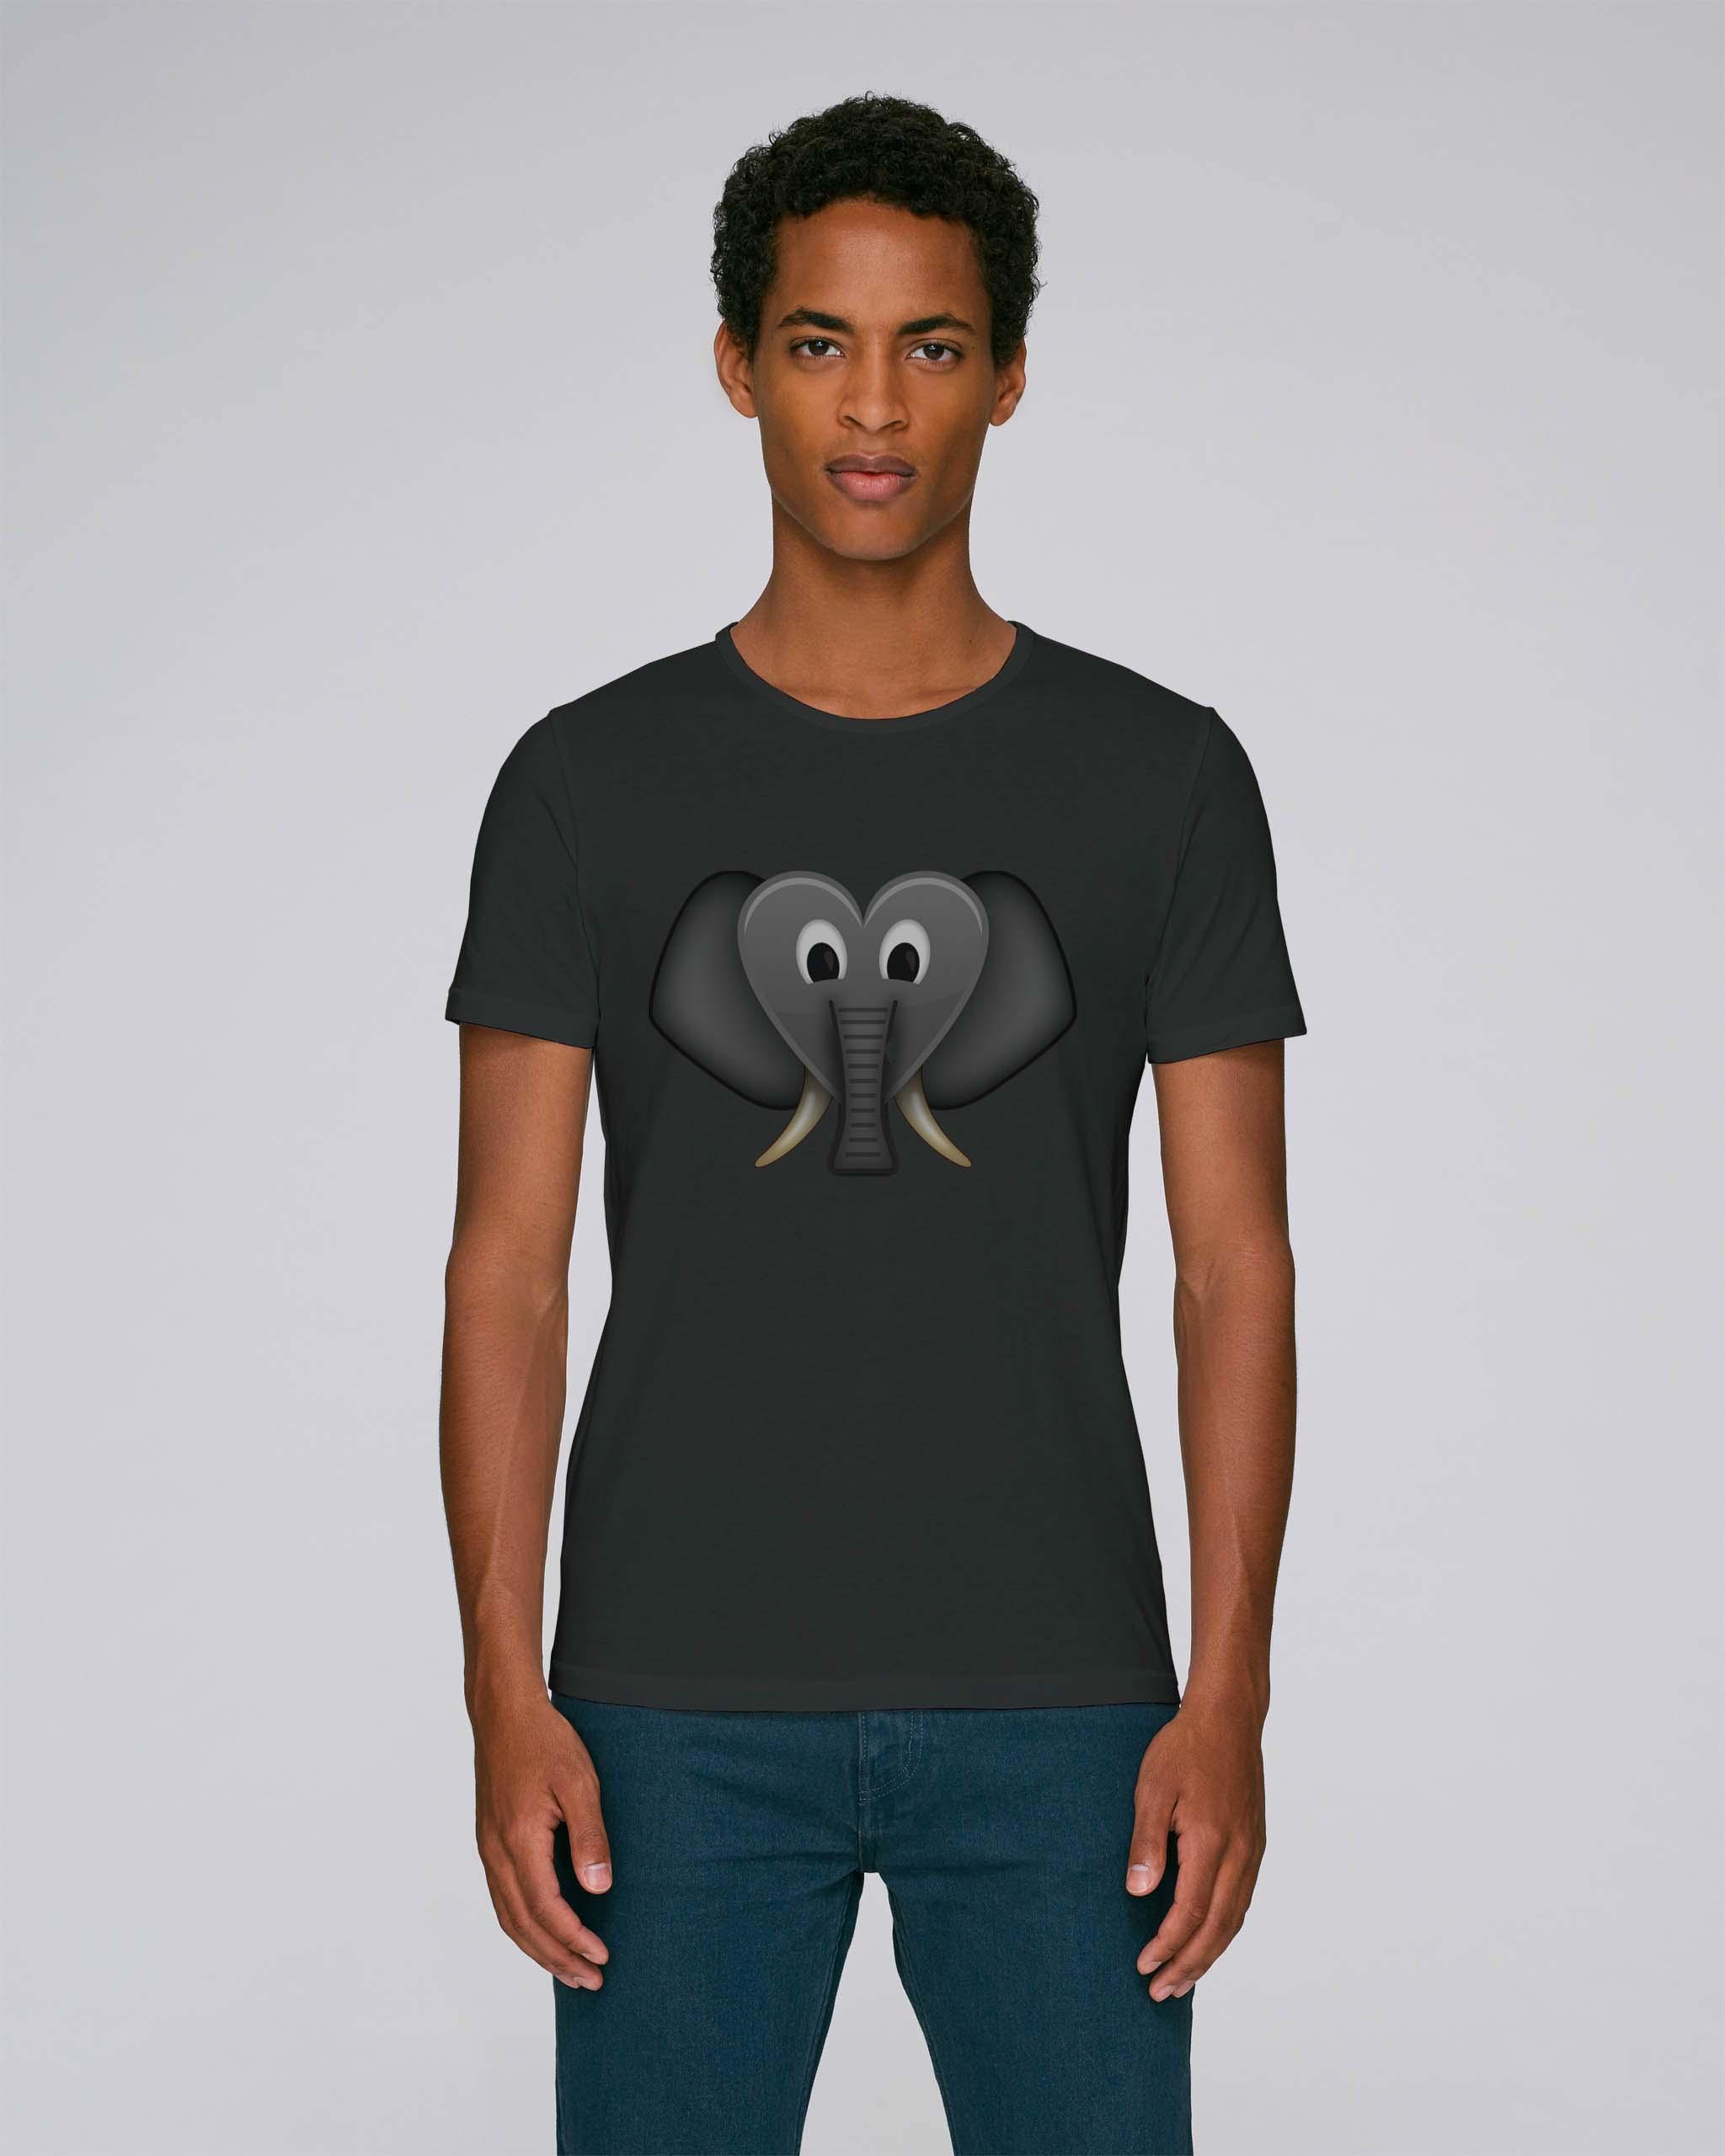 T-Shirt Noir Bio Homme - Coeur elephant tee